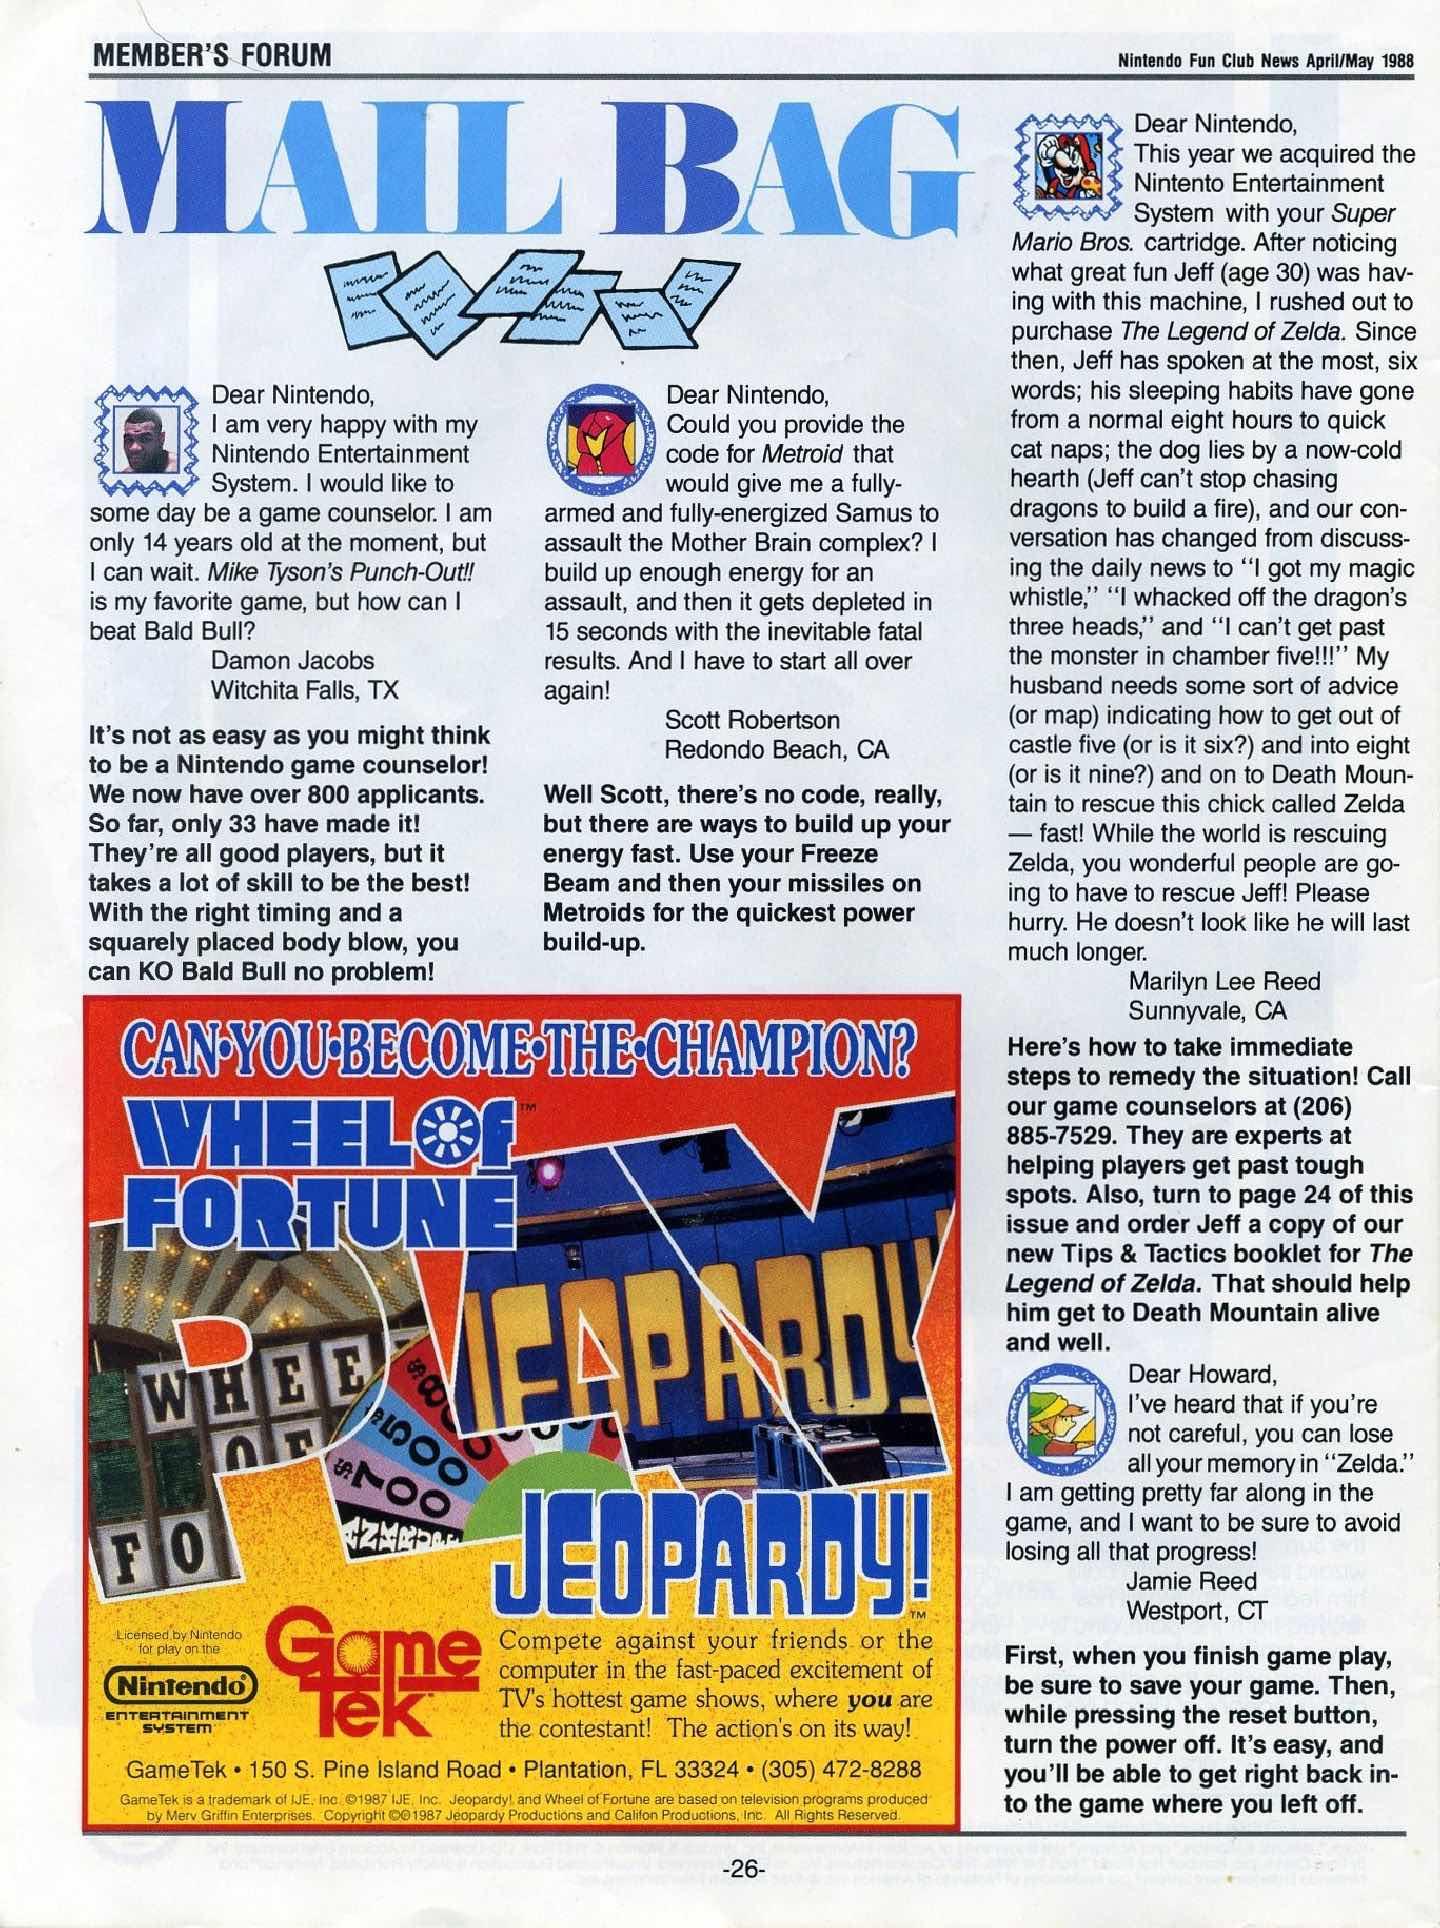 Nintendo Fun Club News April-May 1988 pg26